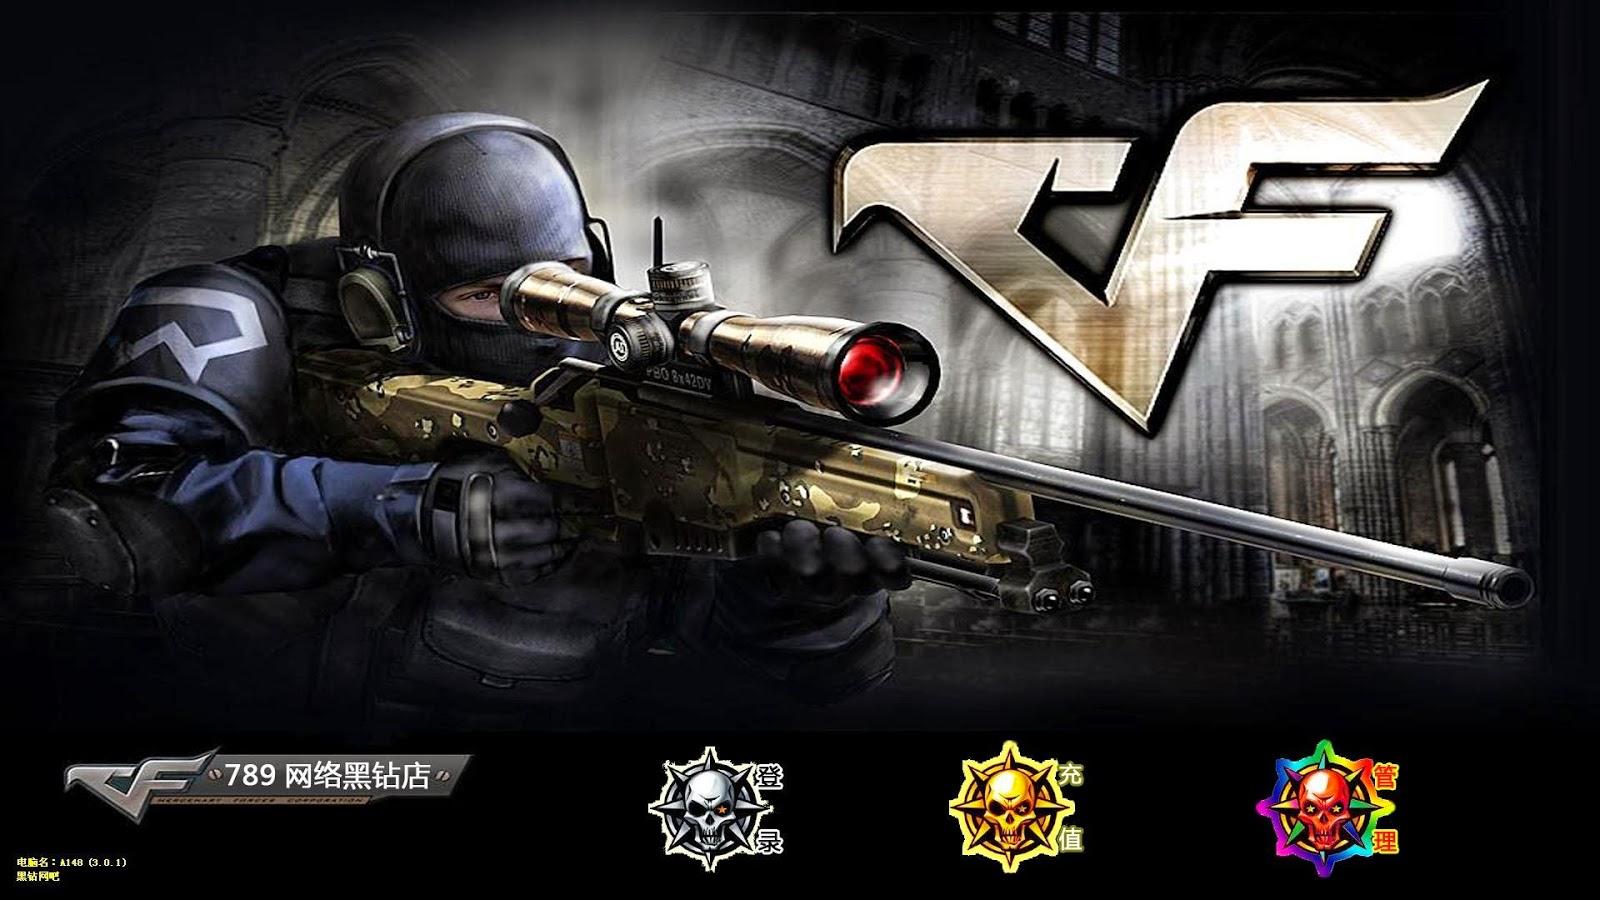 هاك CrossFire بتاريخ 25/6 بعد تحديث X-Trap [ مكشوف] Cross-Fire-Game-Image-Wallpaper